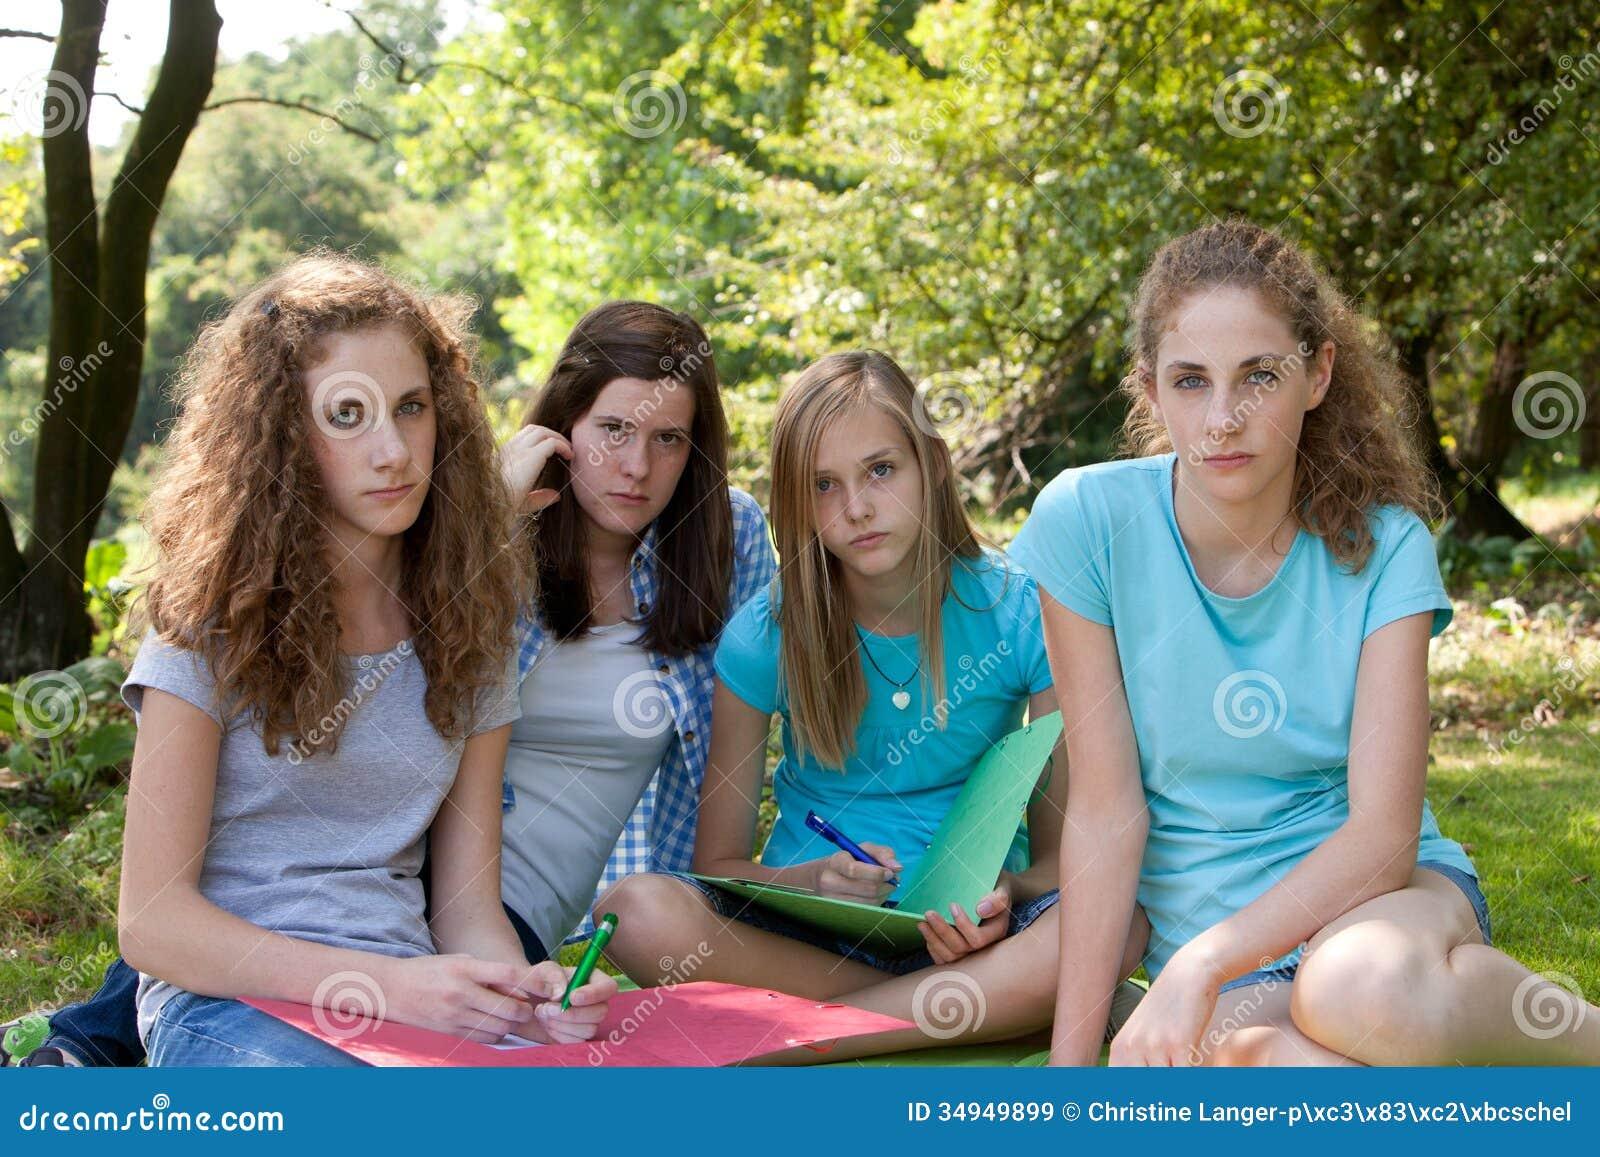 Groups Of Nude Teenagers 76